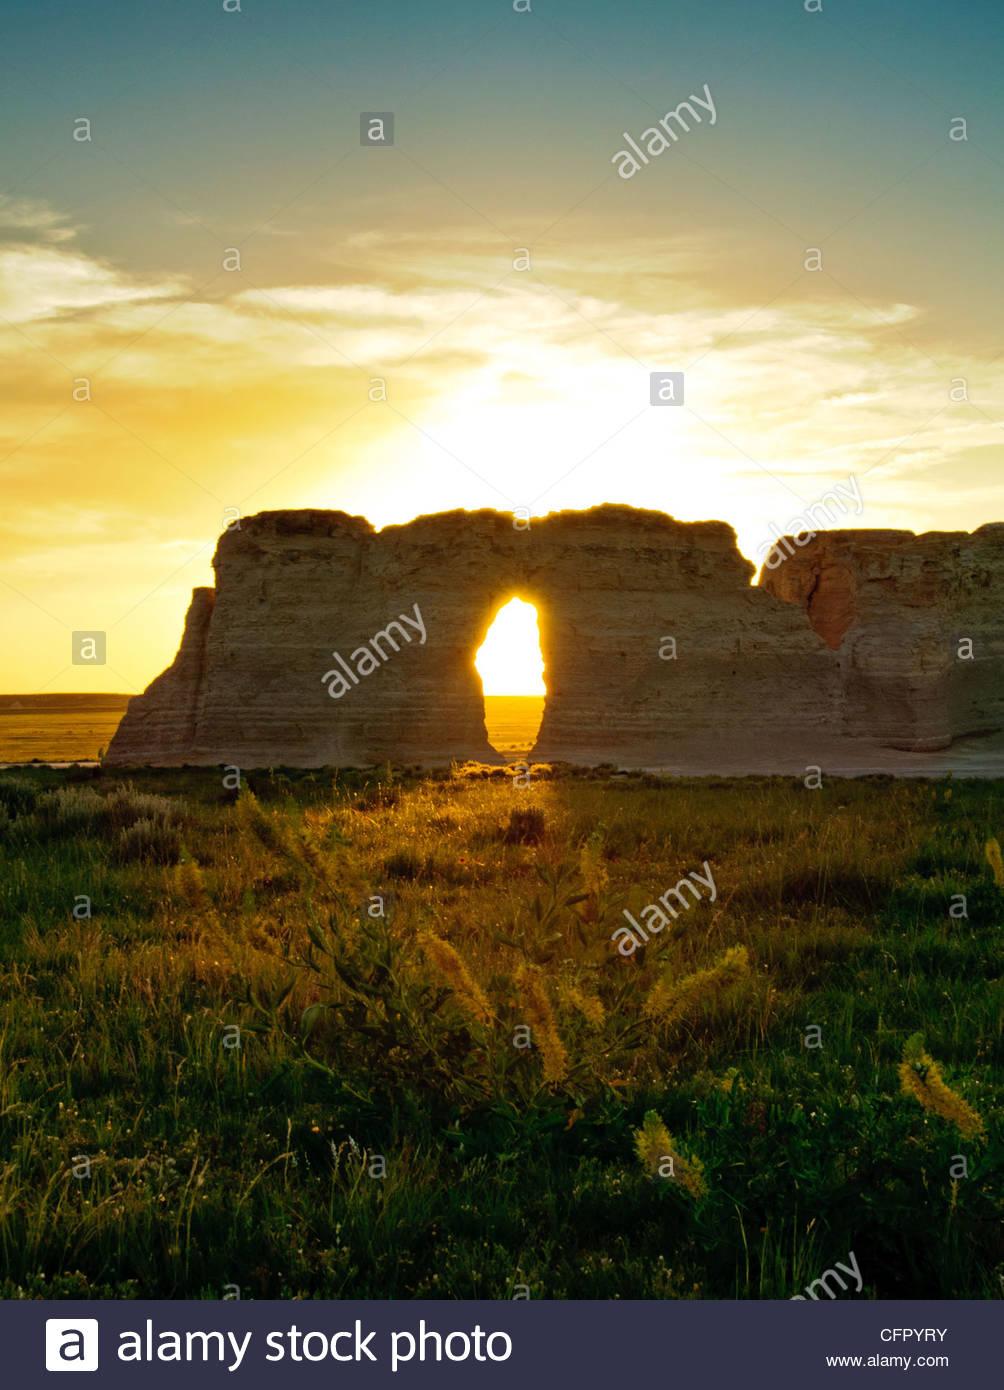 Monument Rocks, Sunset, Gove County, KS, June 4, 2010 - Stock Image